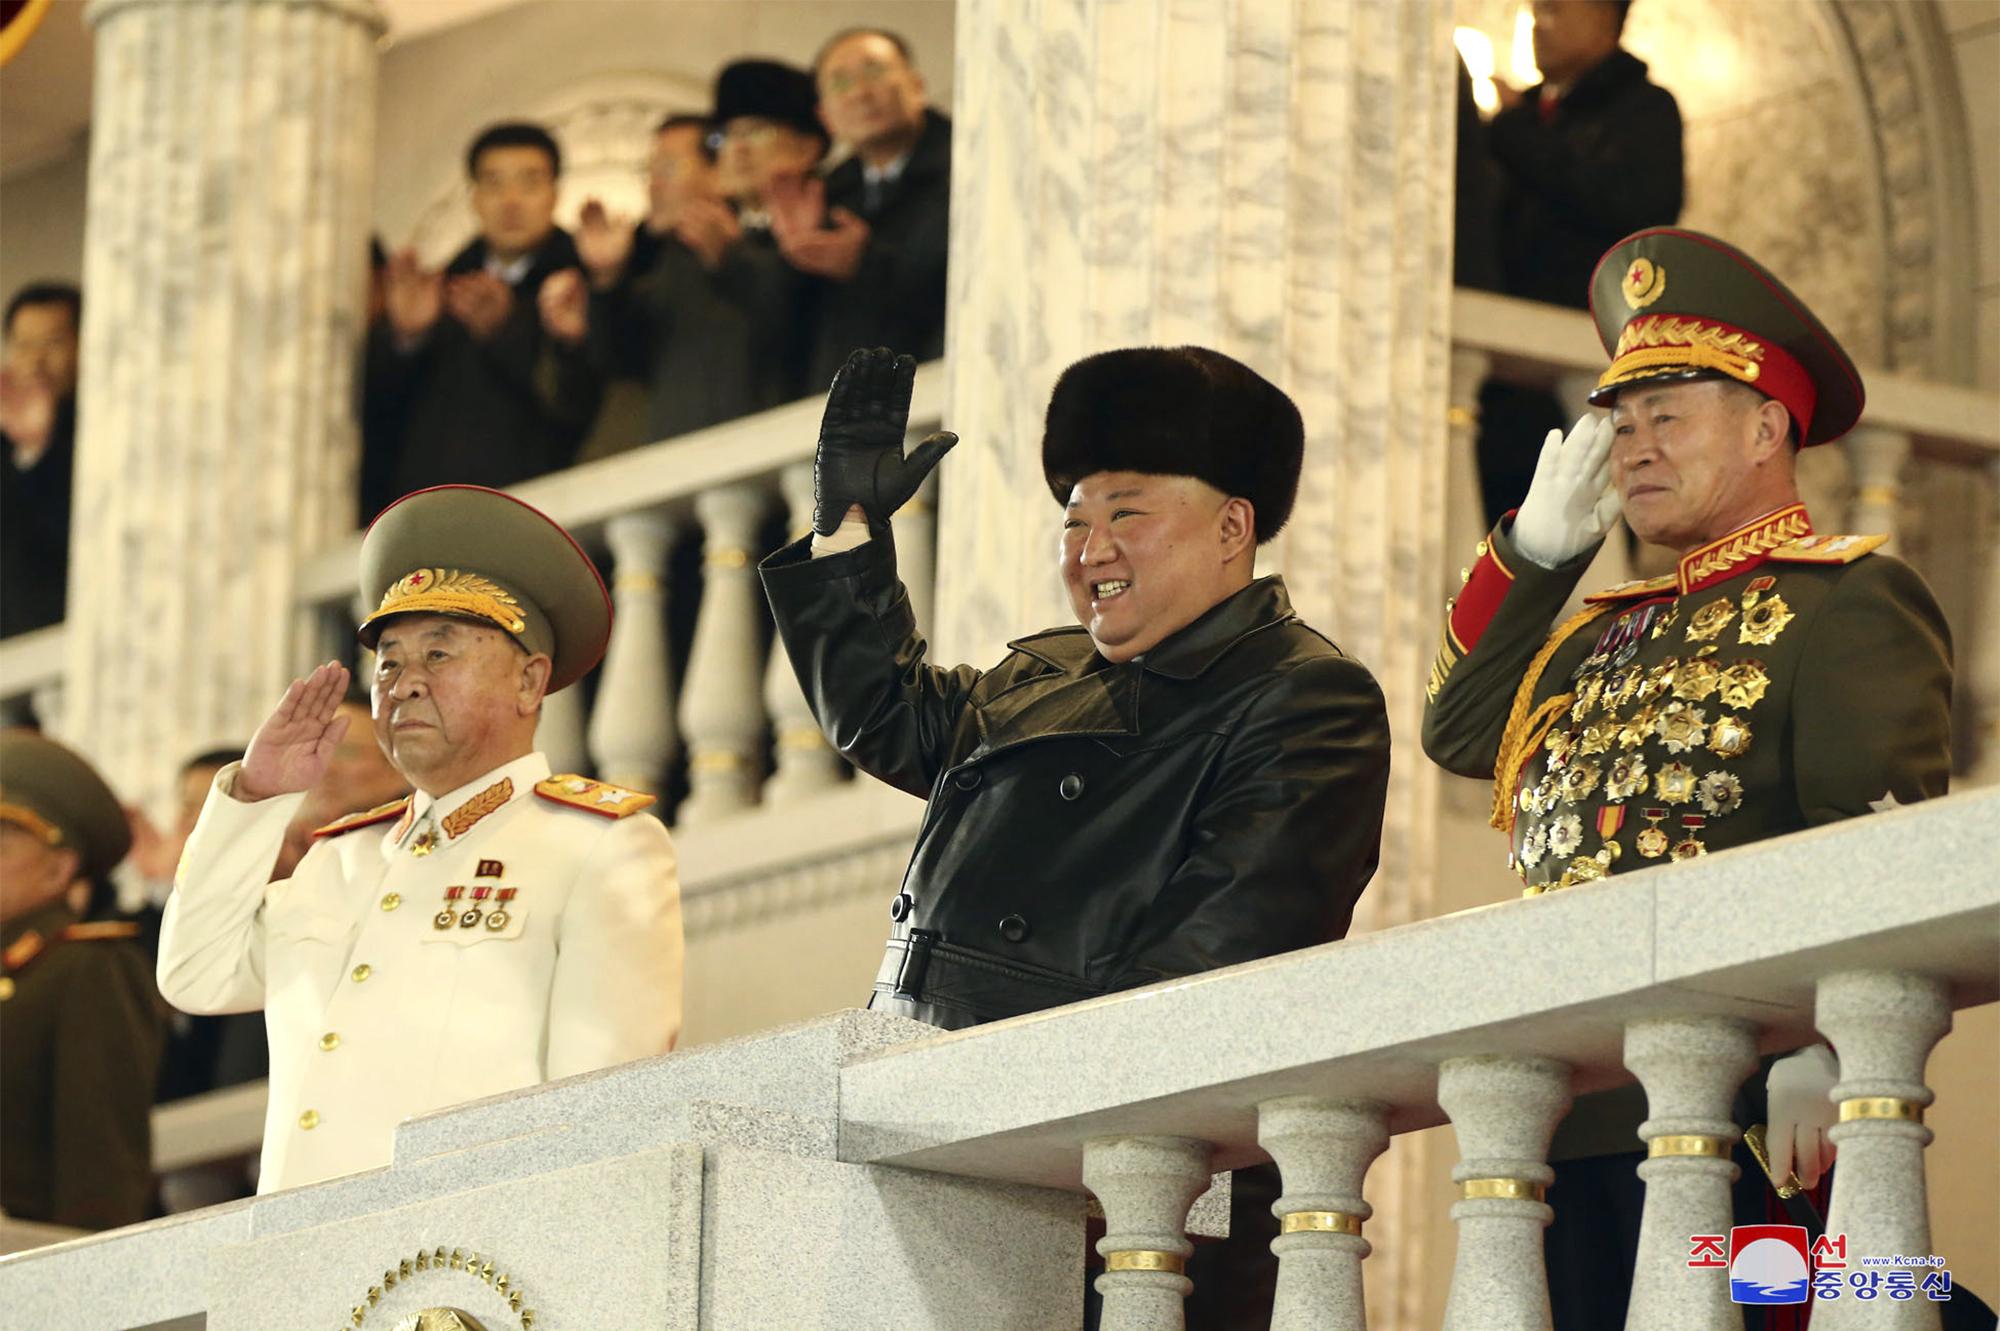 North Korean leader Kim Jong Un waves during a military parade in Pyongyang North Korea on Jan. 14 2021